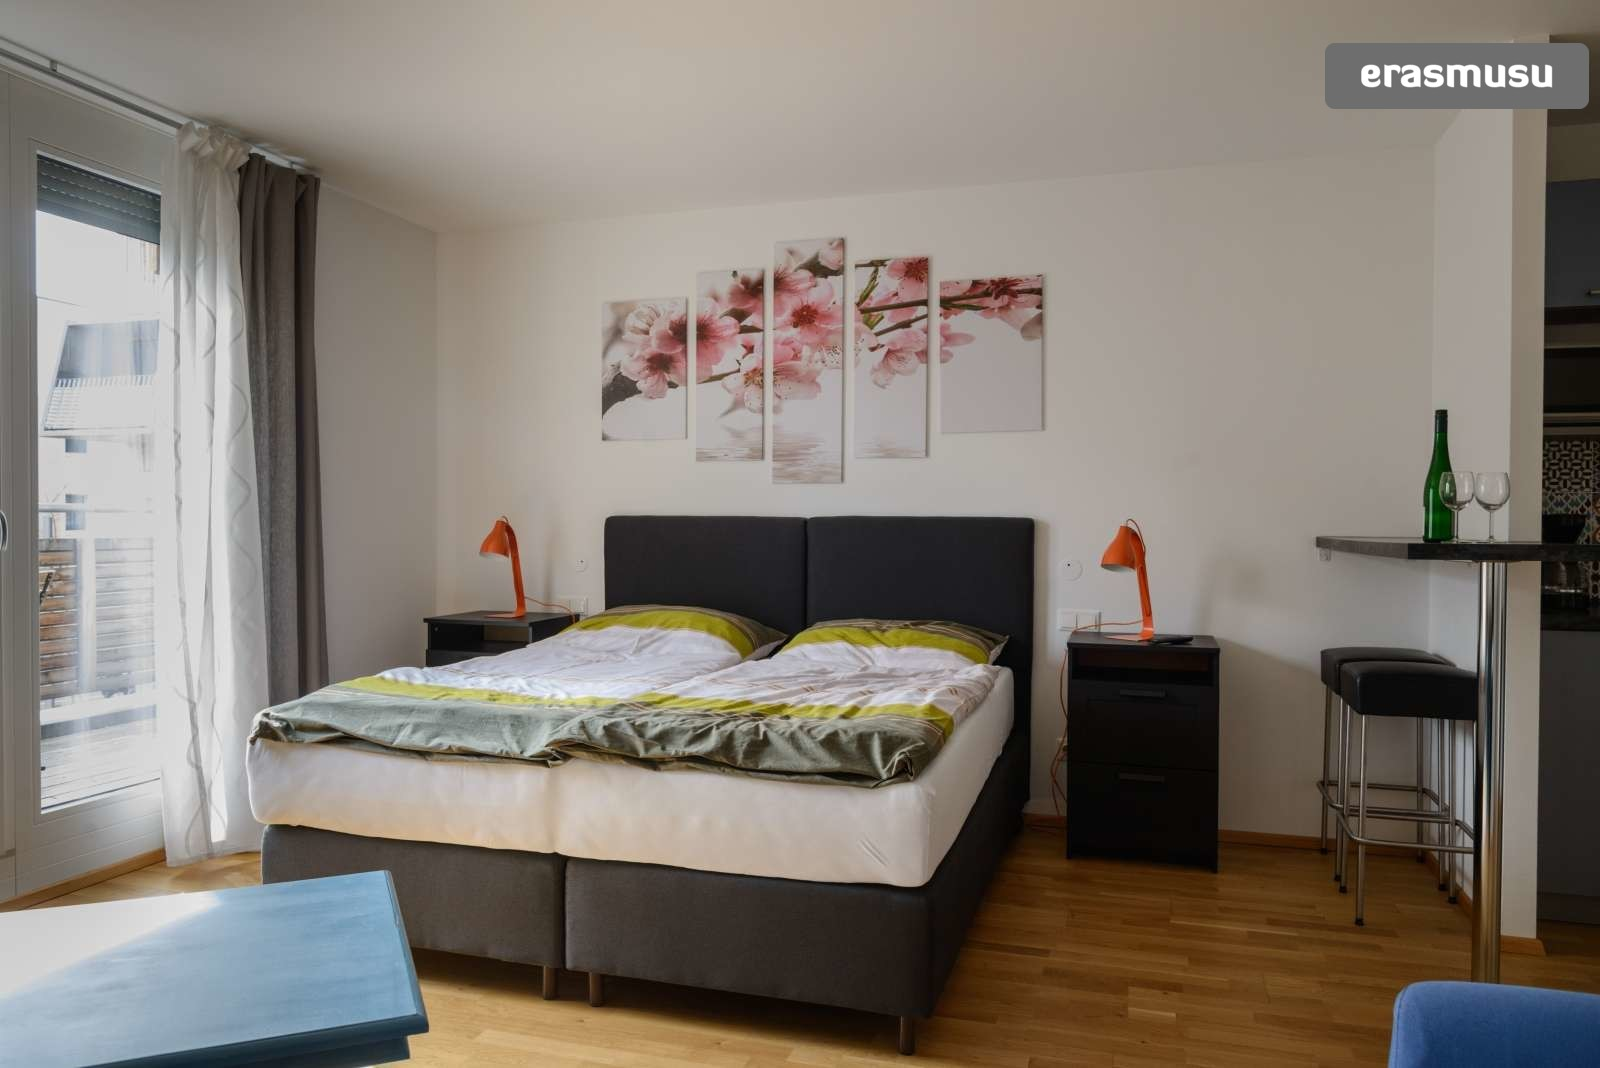 spacious-studio-apartment-rent-aspern-area-donaustadt-7e1af38ea2